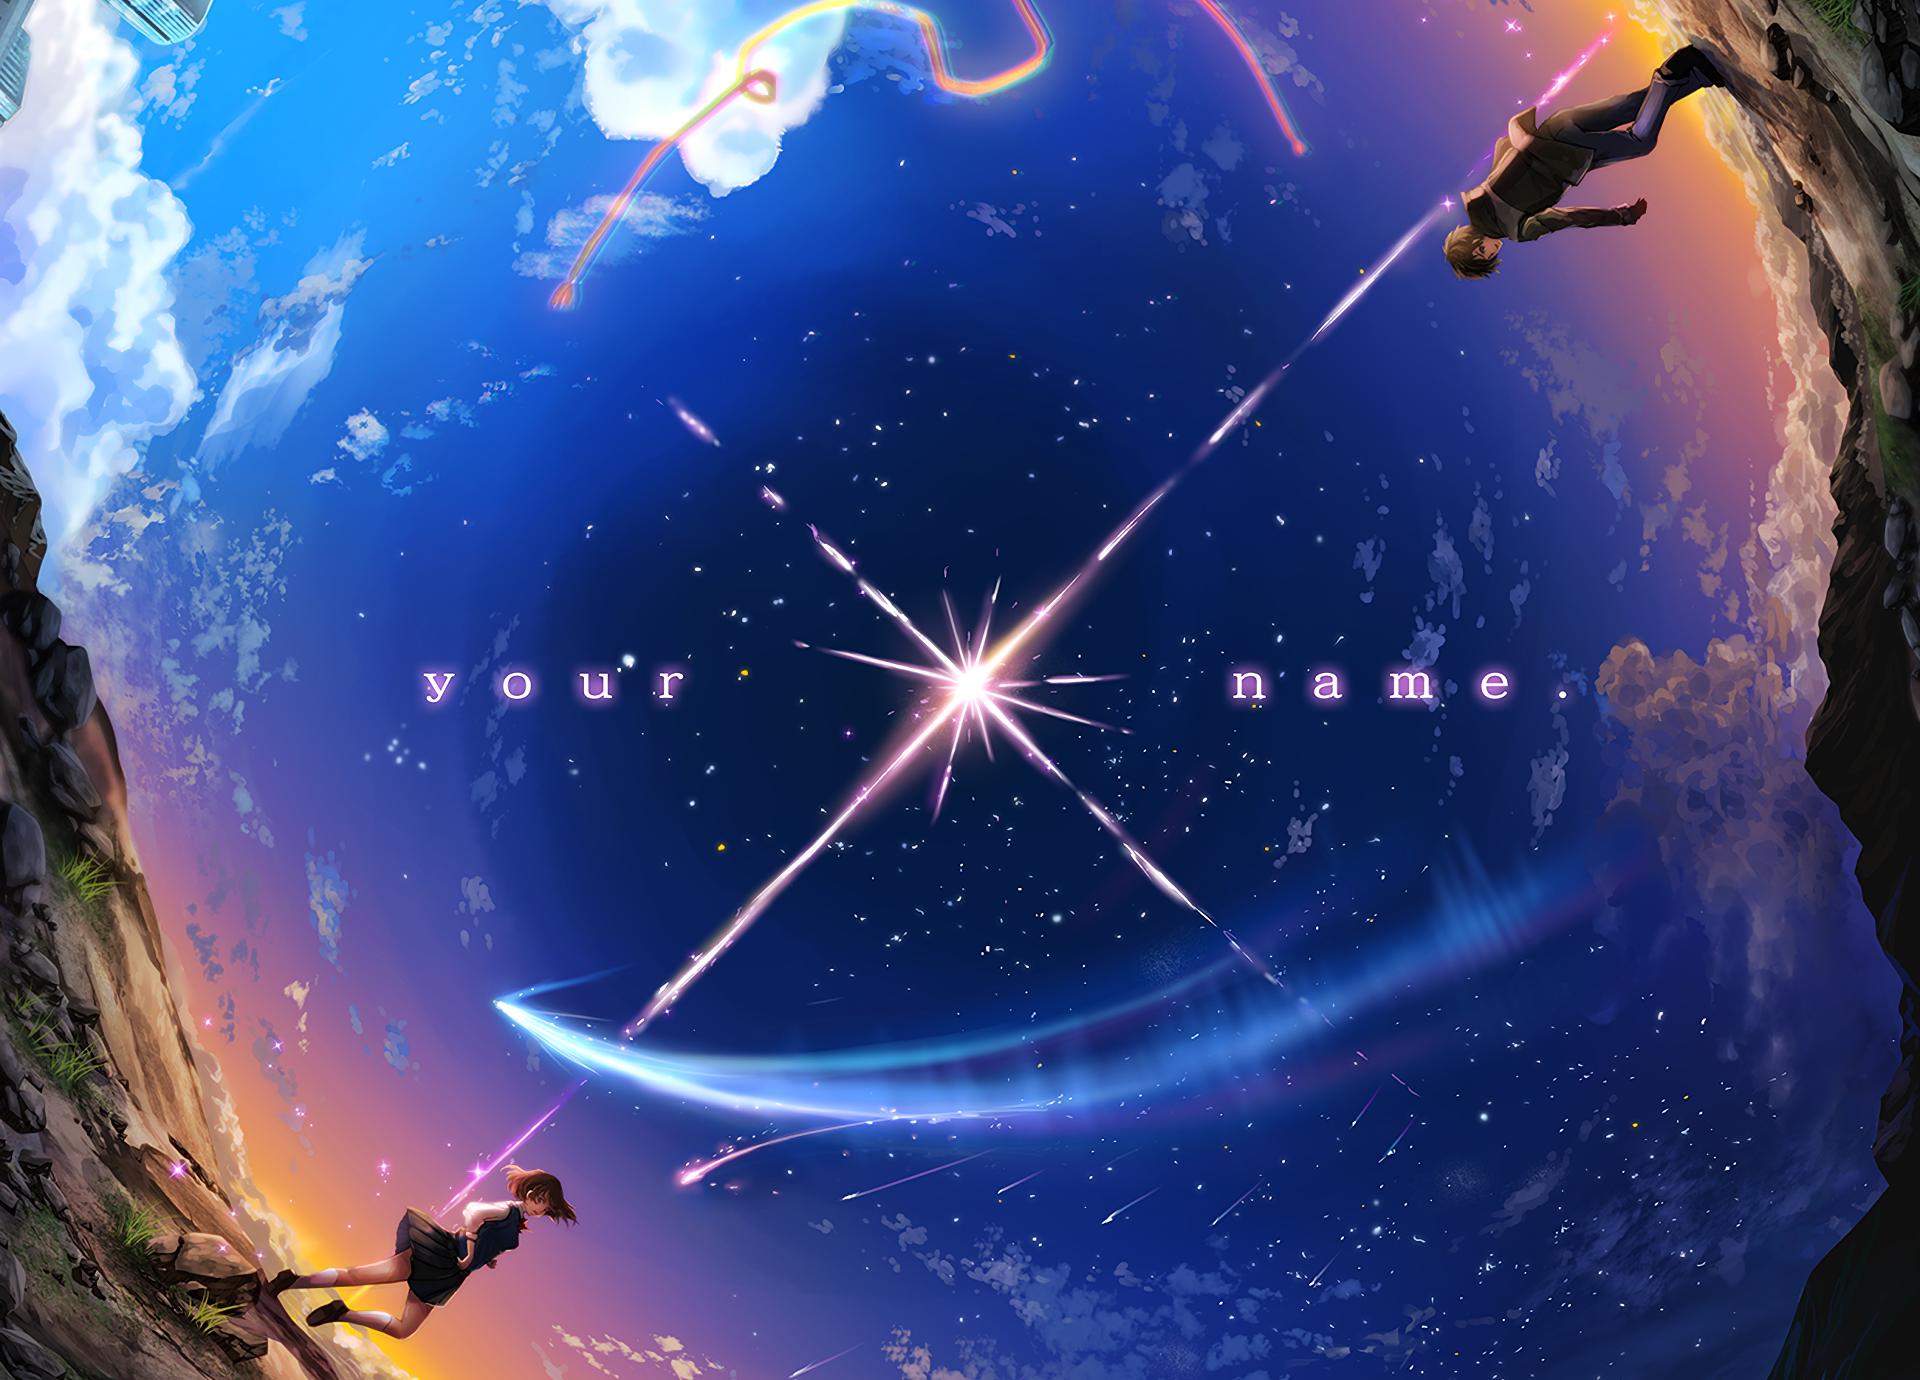 Wallpaper : anime, planet, Earth, Miyamizu Mitsuha, your name, universe, Tachibana Taki ...